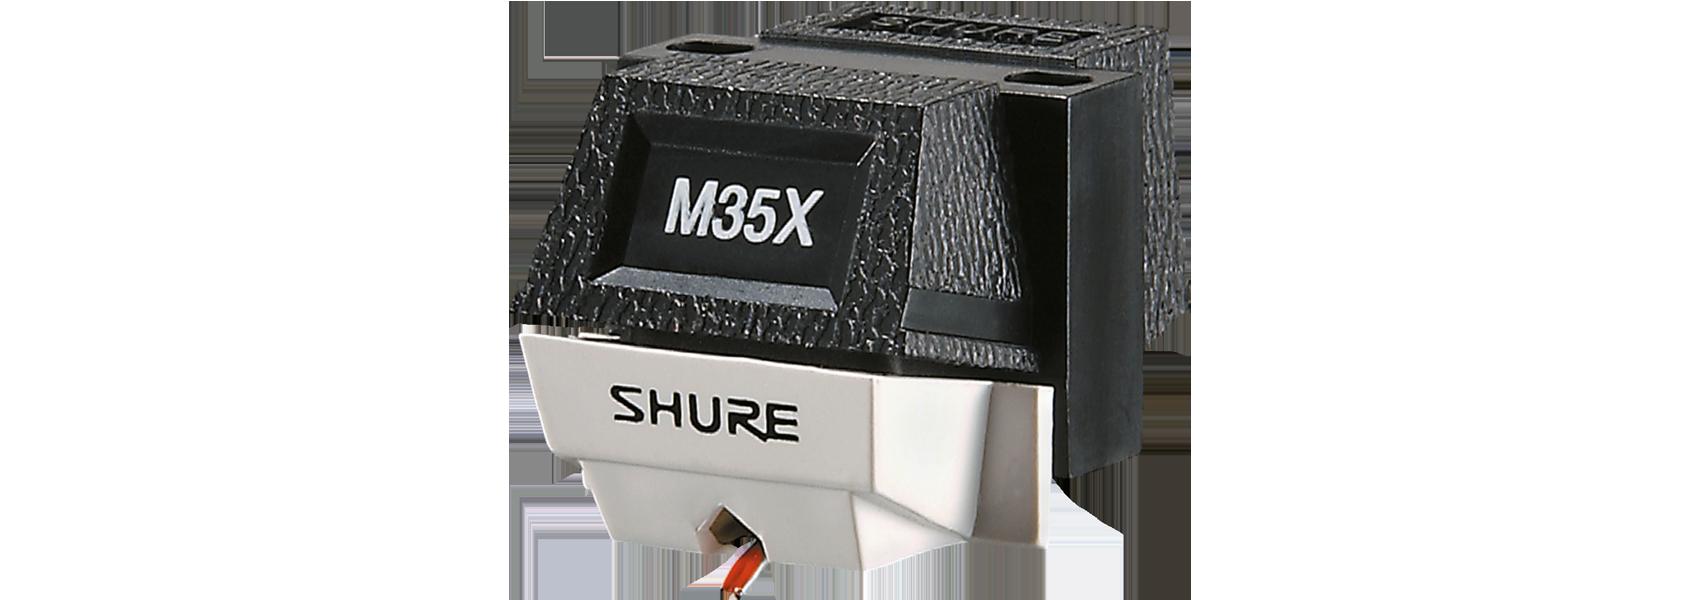 Immagine Shure M35X Testina Fonografica per DJ